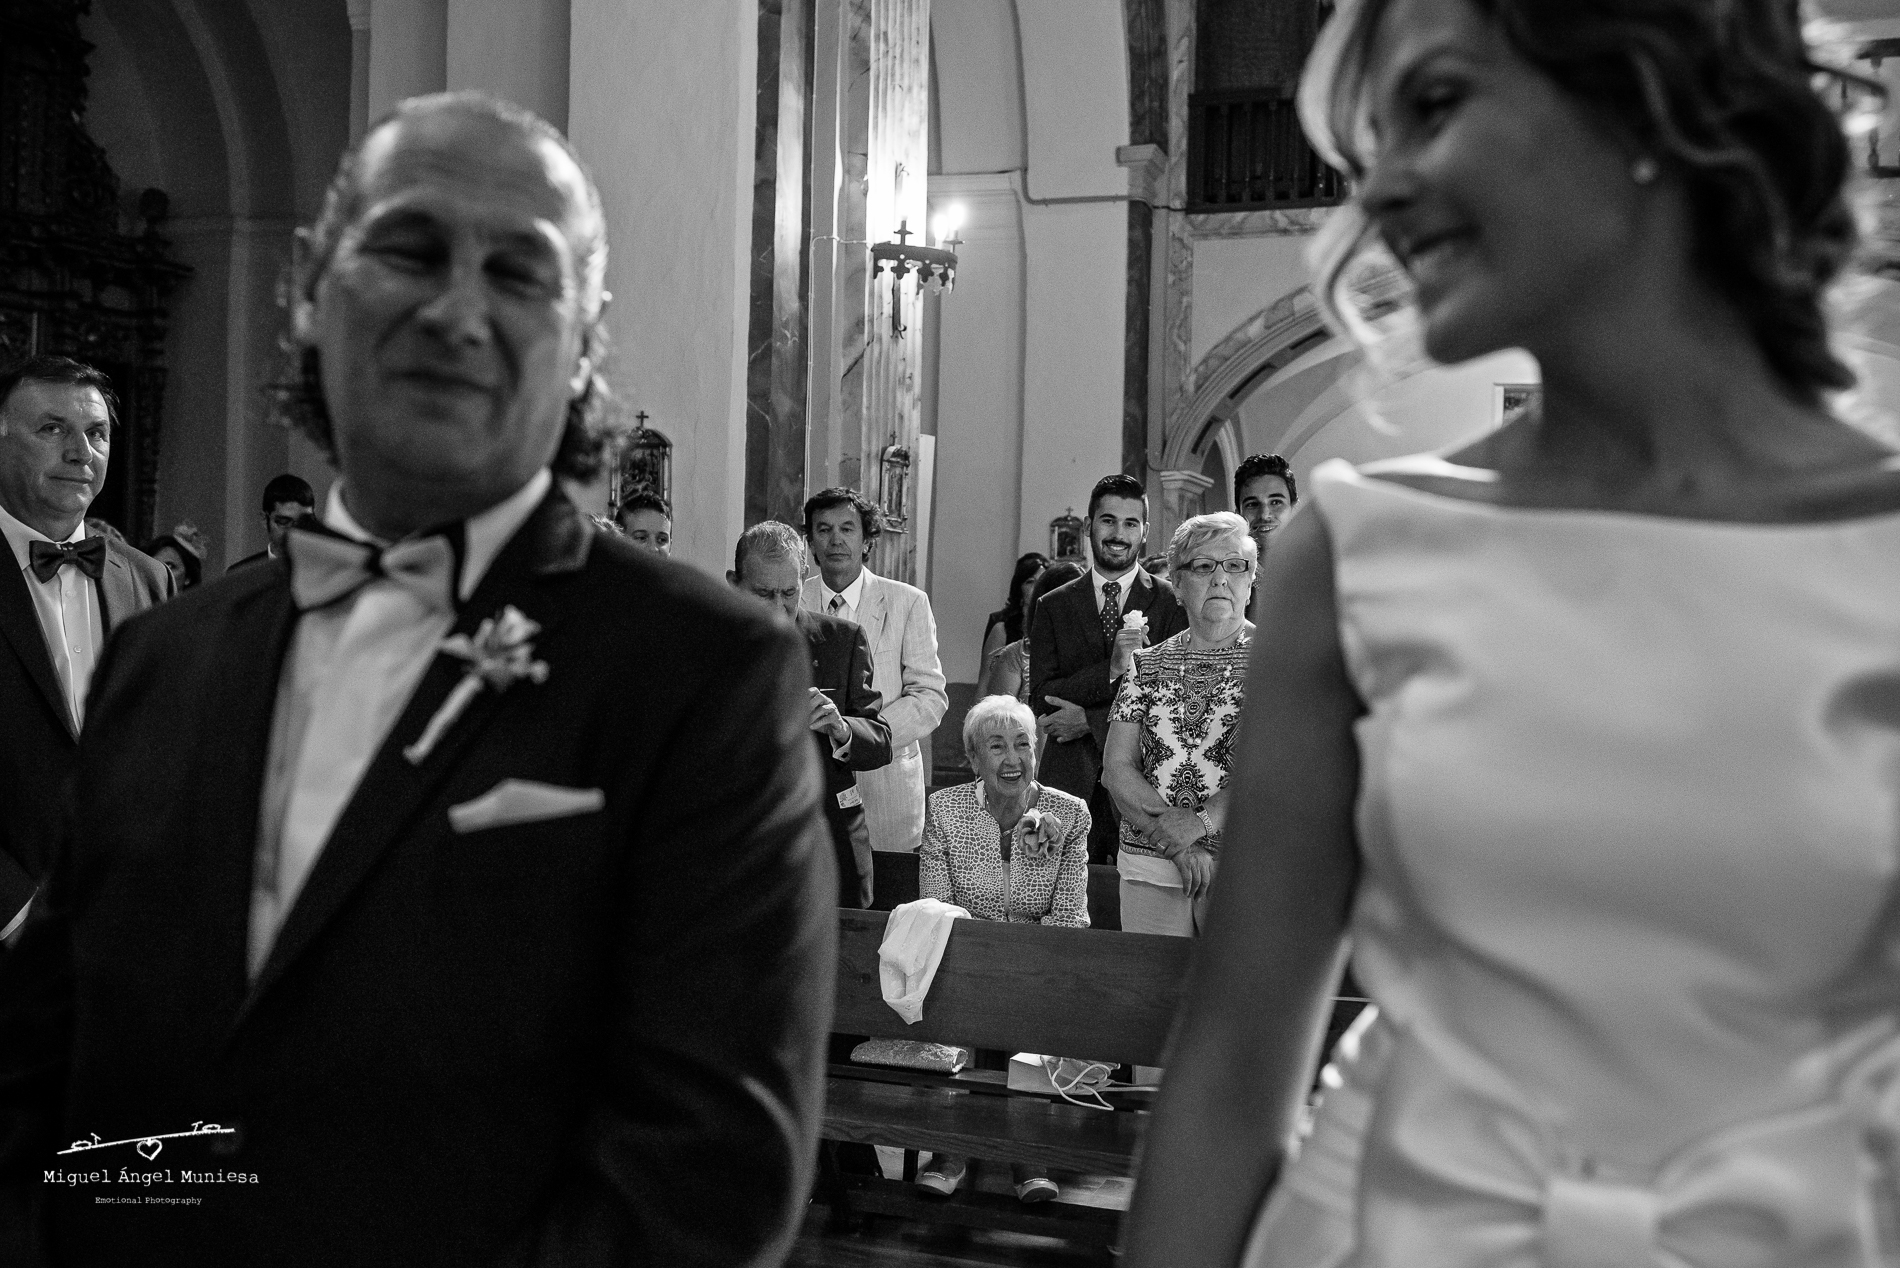 boda, fotografia de boda, boda zaragoza, fotografia, wedding, wedding photography, miguel angel muniesa, fotografo boda Zaragoza, fotografo boda, destination wedding_ 025